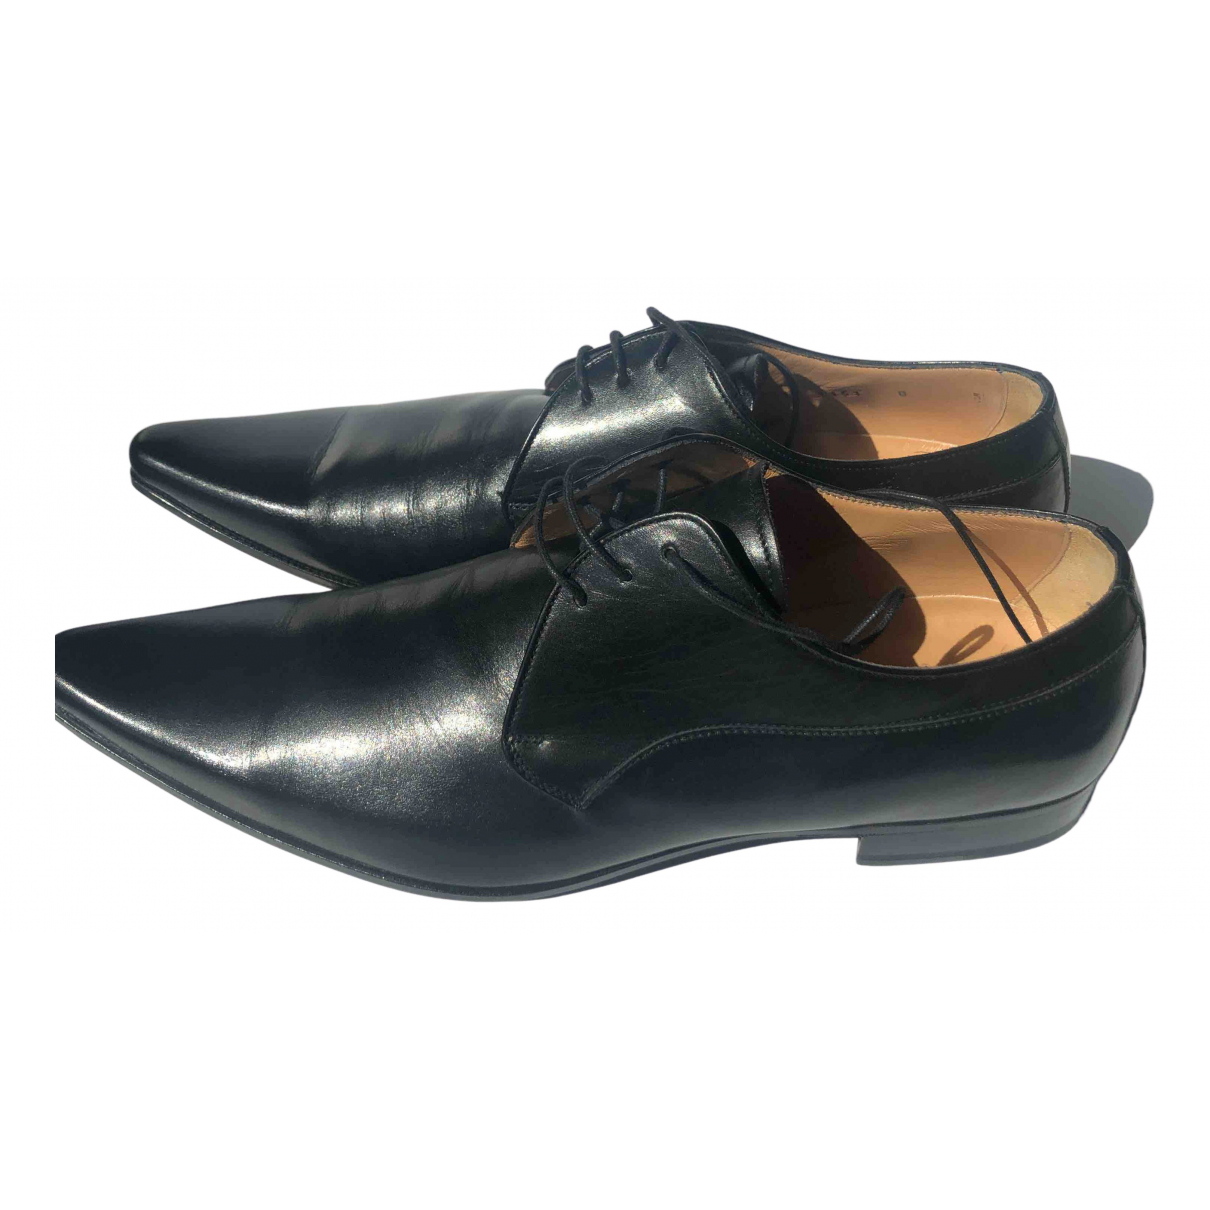 Dolce & Gabbana \N Black Leather Lace ups for Men 8 UK